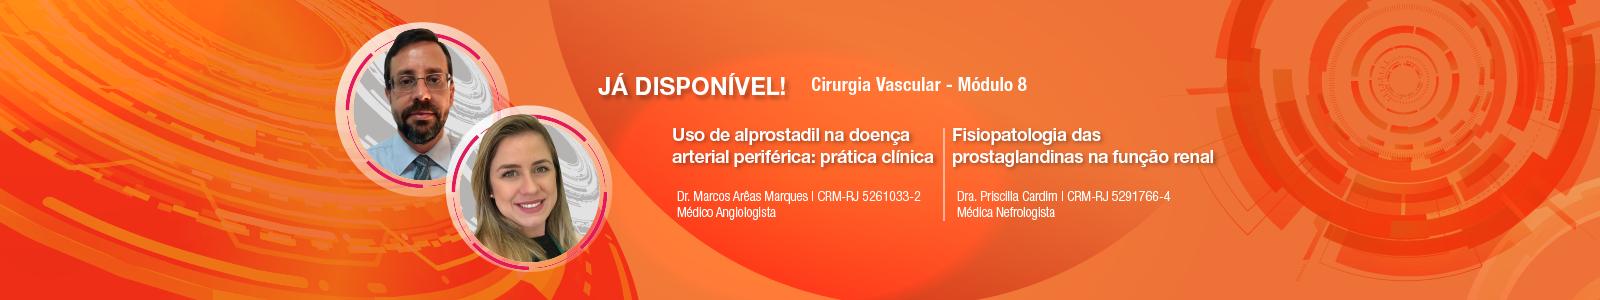 Visão Aché2021-banners vascular-1 1 cópia 3